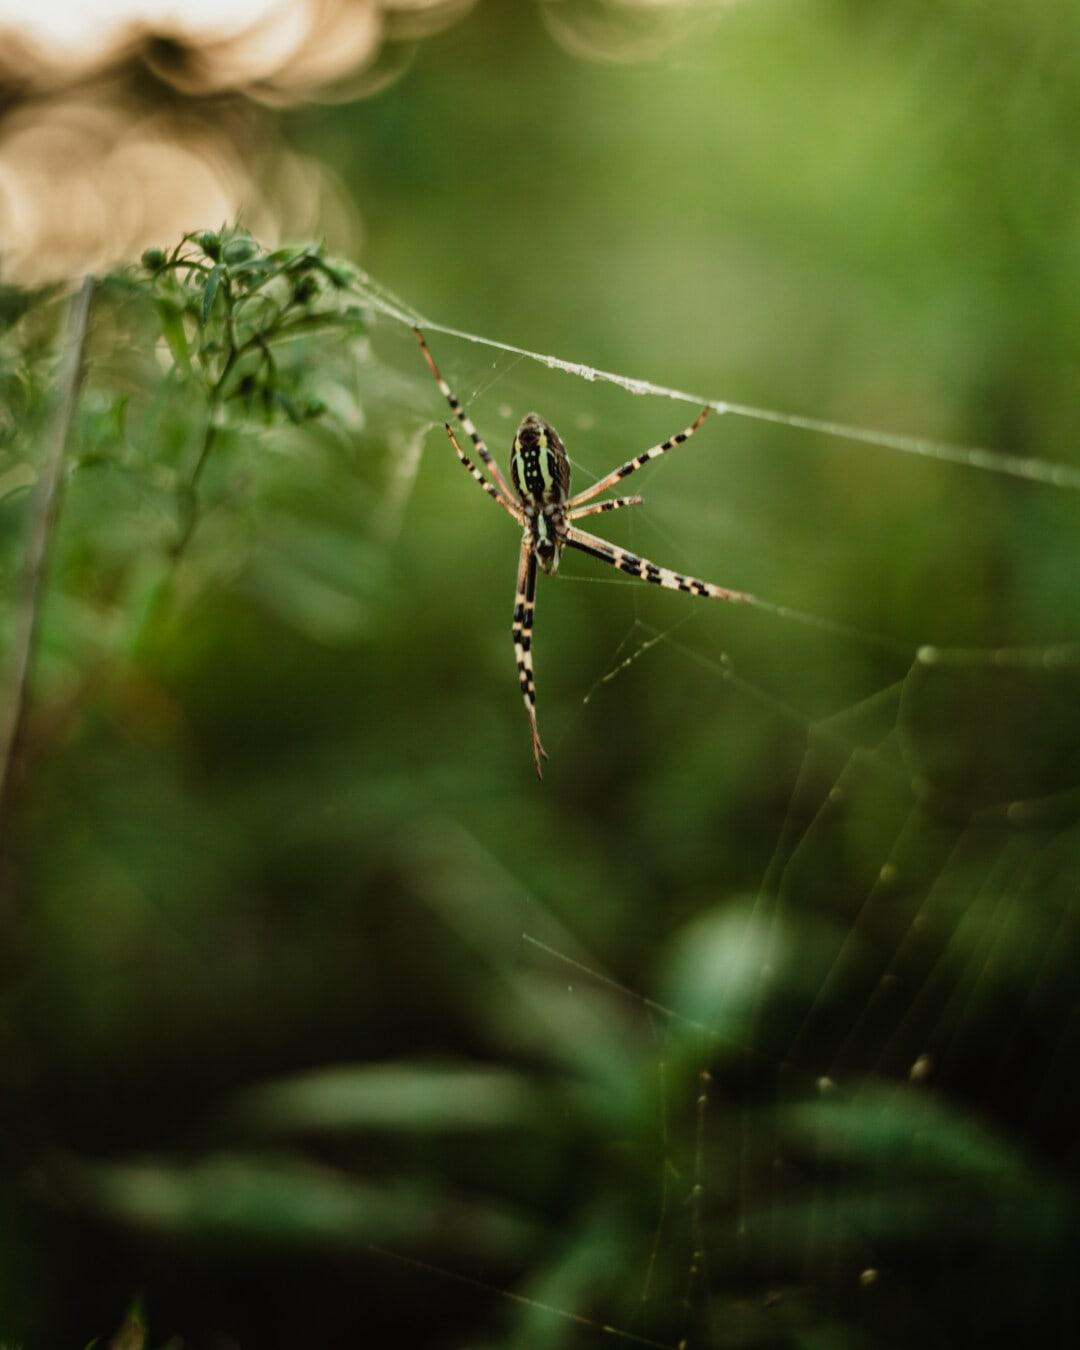 spider, spiderweb, close-up, wilderness, animal, green, insect, animals, blurry, detail